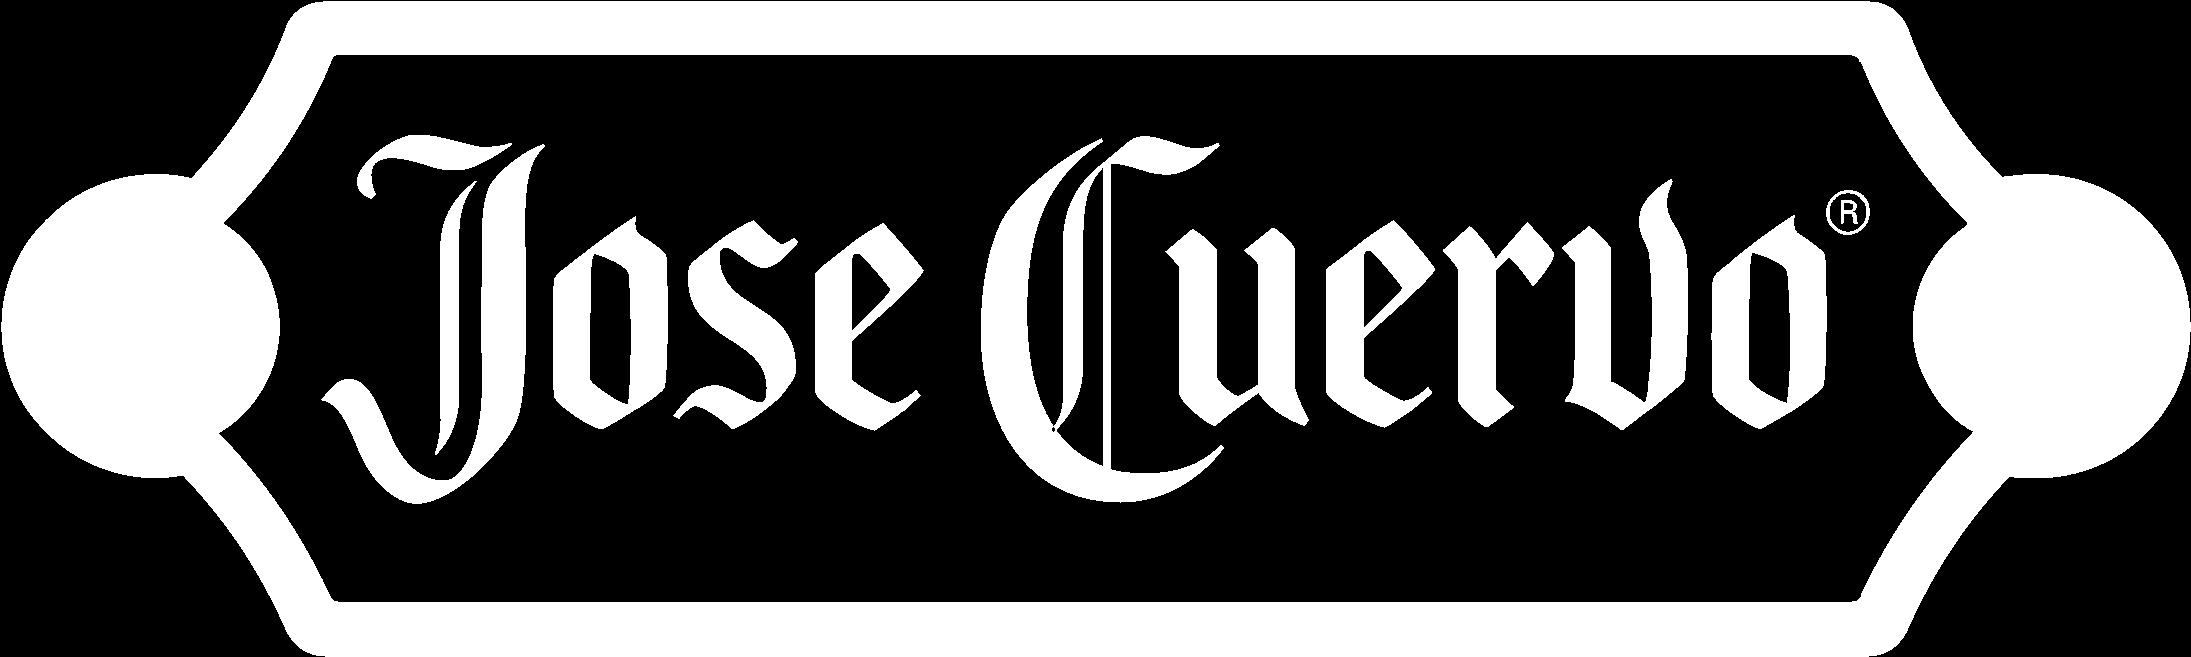 HD Jose Cuervo Logo Black And White.